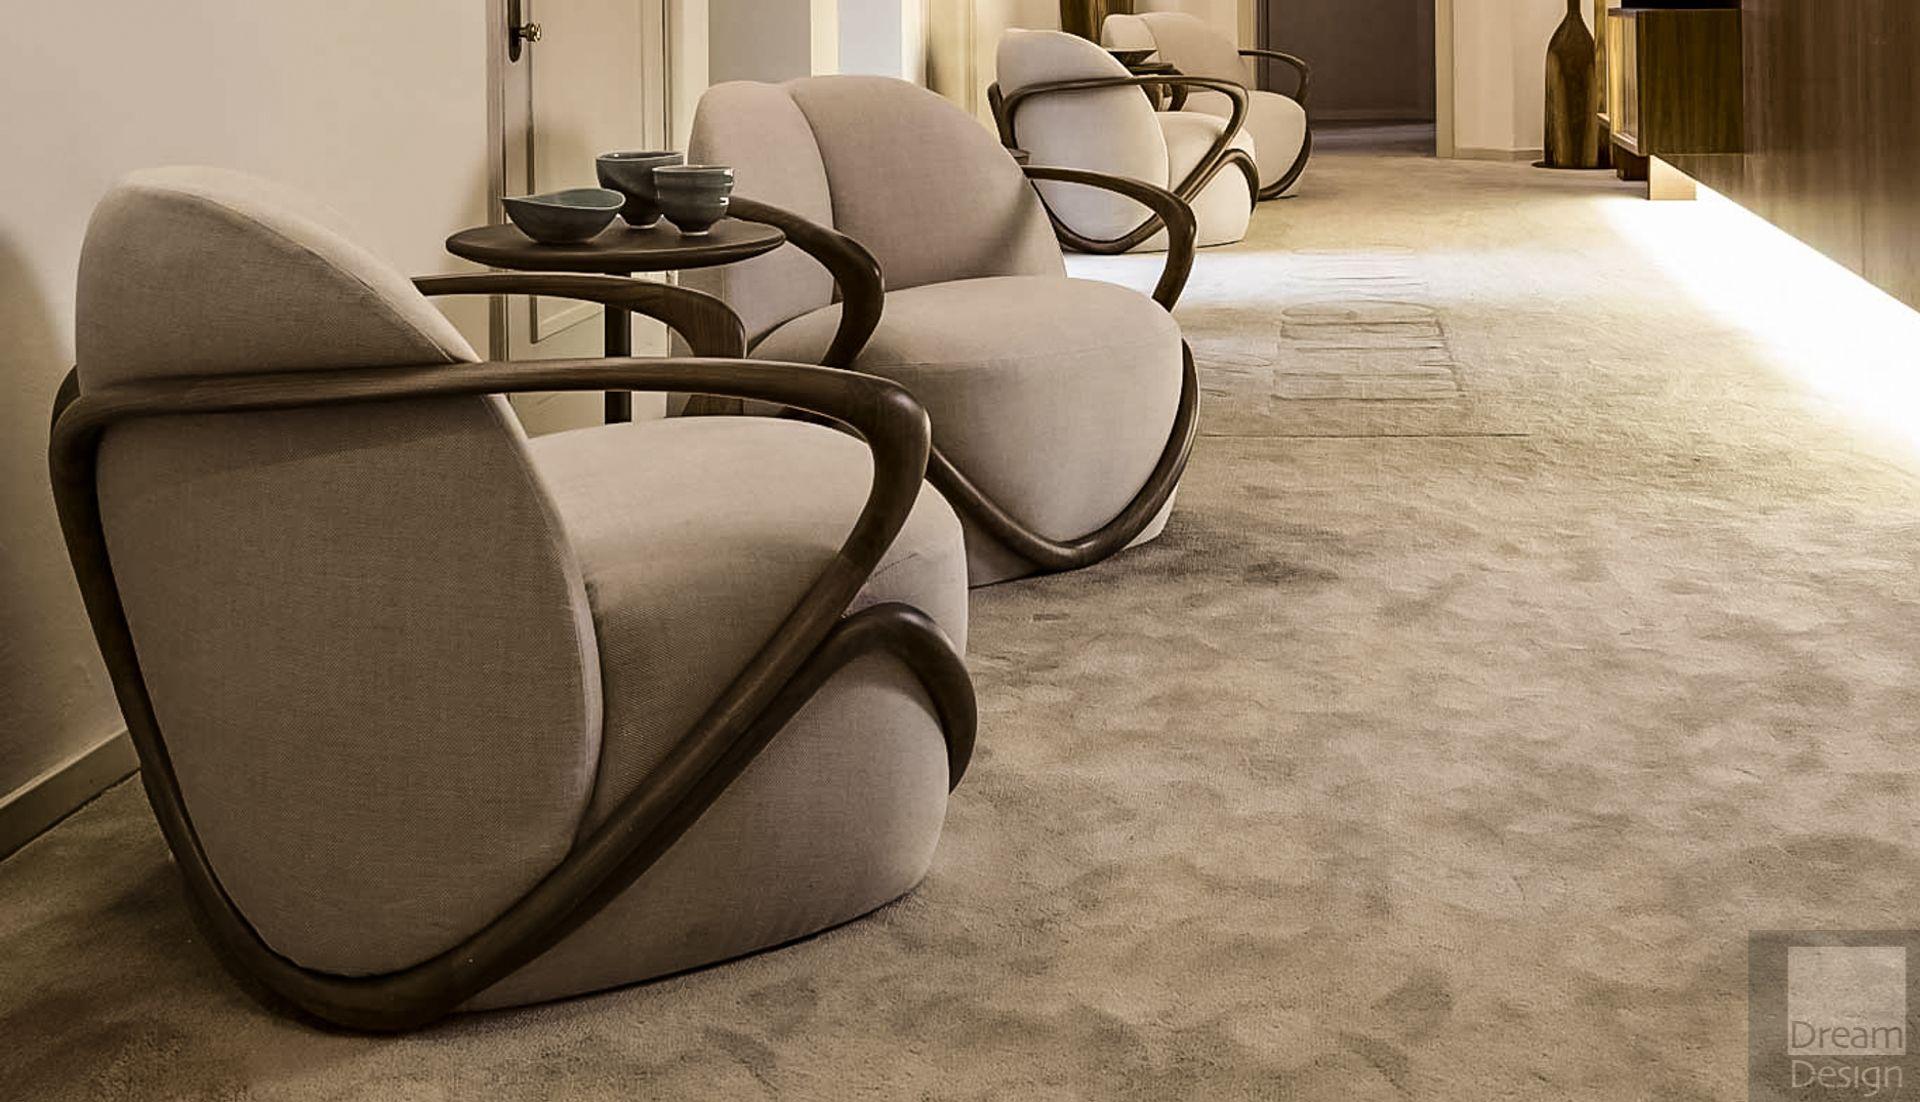 Hug Armchair Furniture upholstery, Furniture